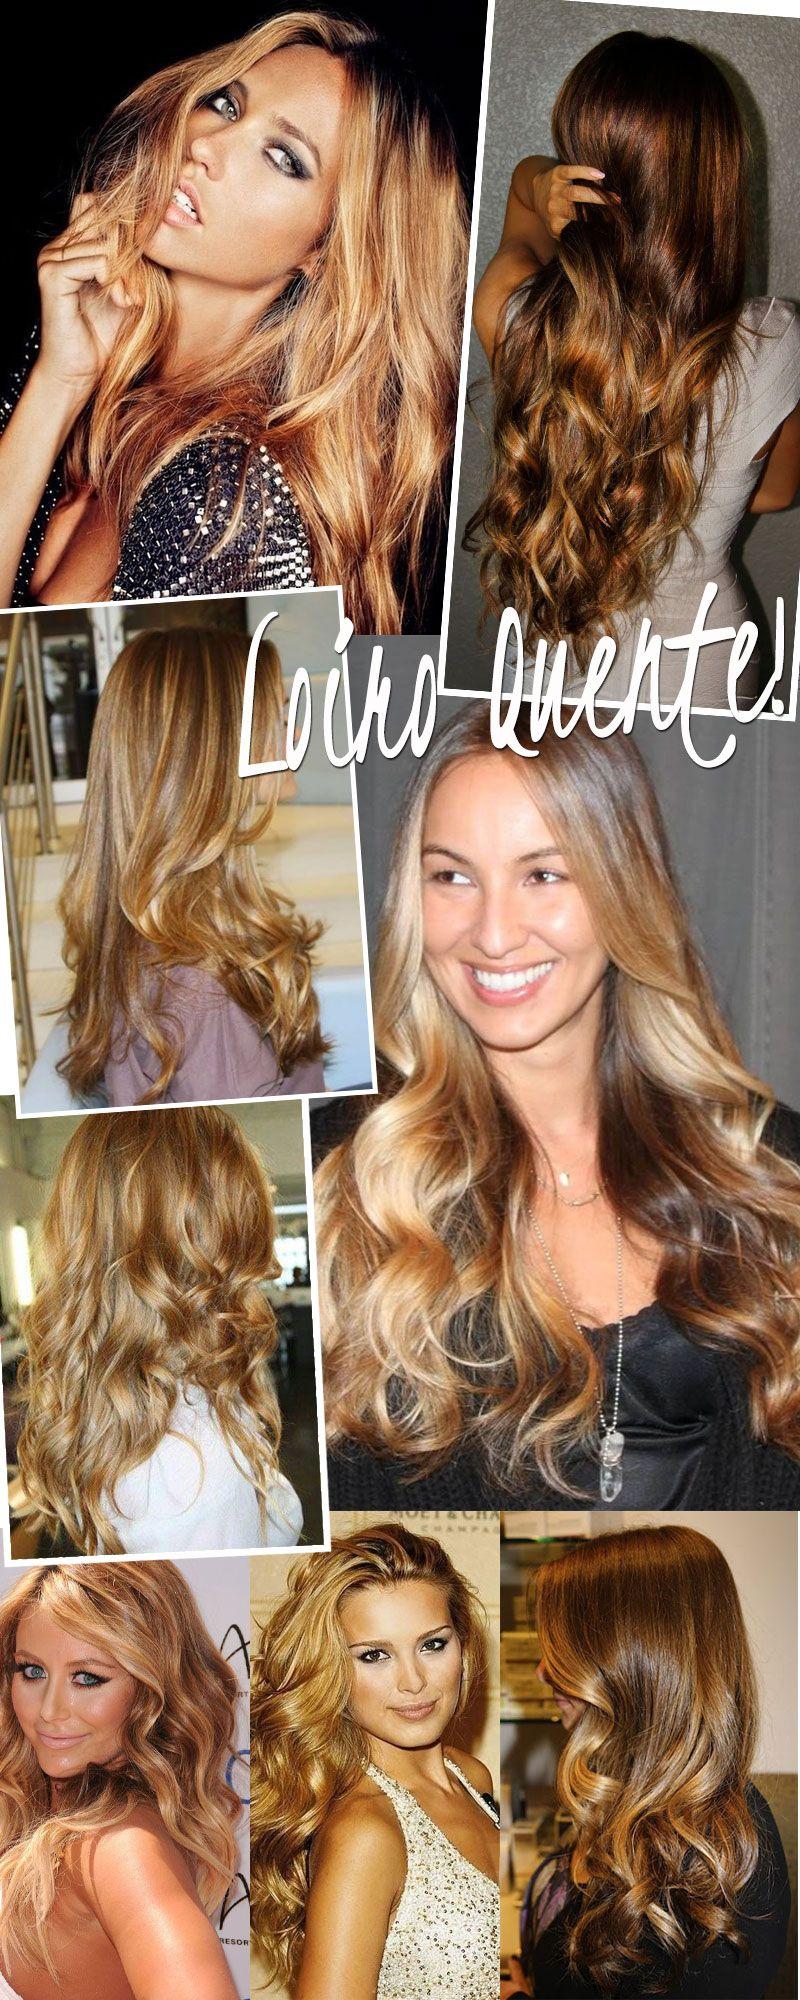 Cabelos loiros os tons do verão blonde wavy hair hair coloring